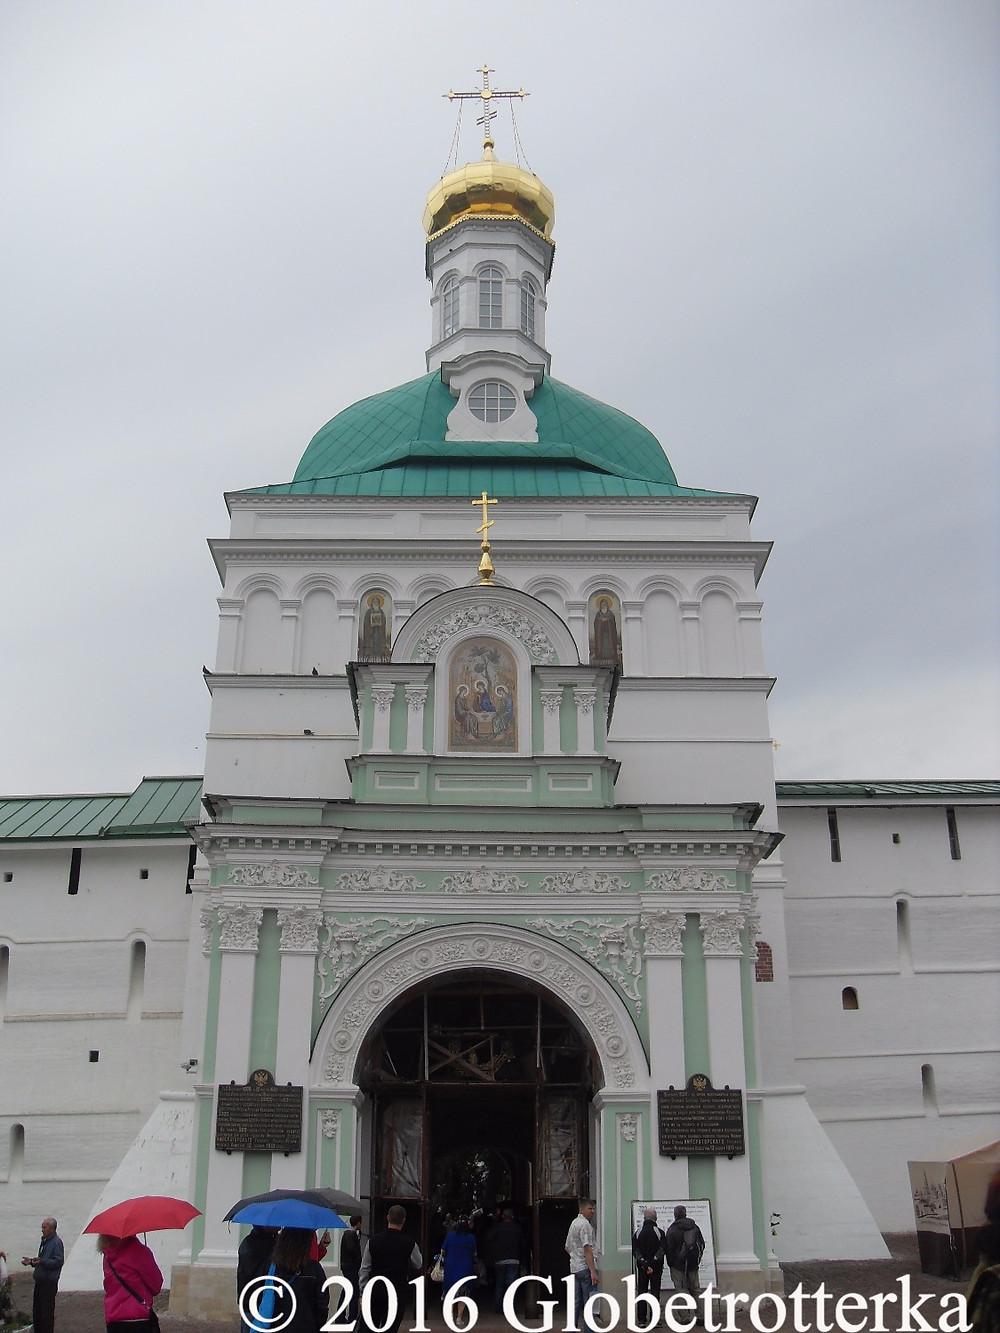 Une des portes du kremlin de Serguiev Posad © 2016 Globetrotterka